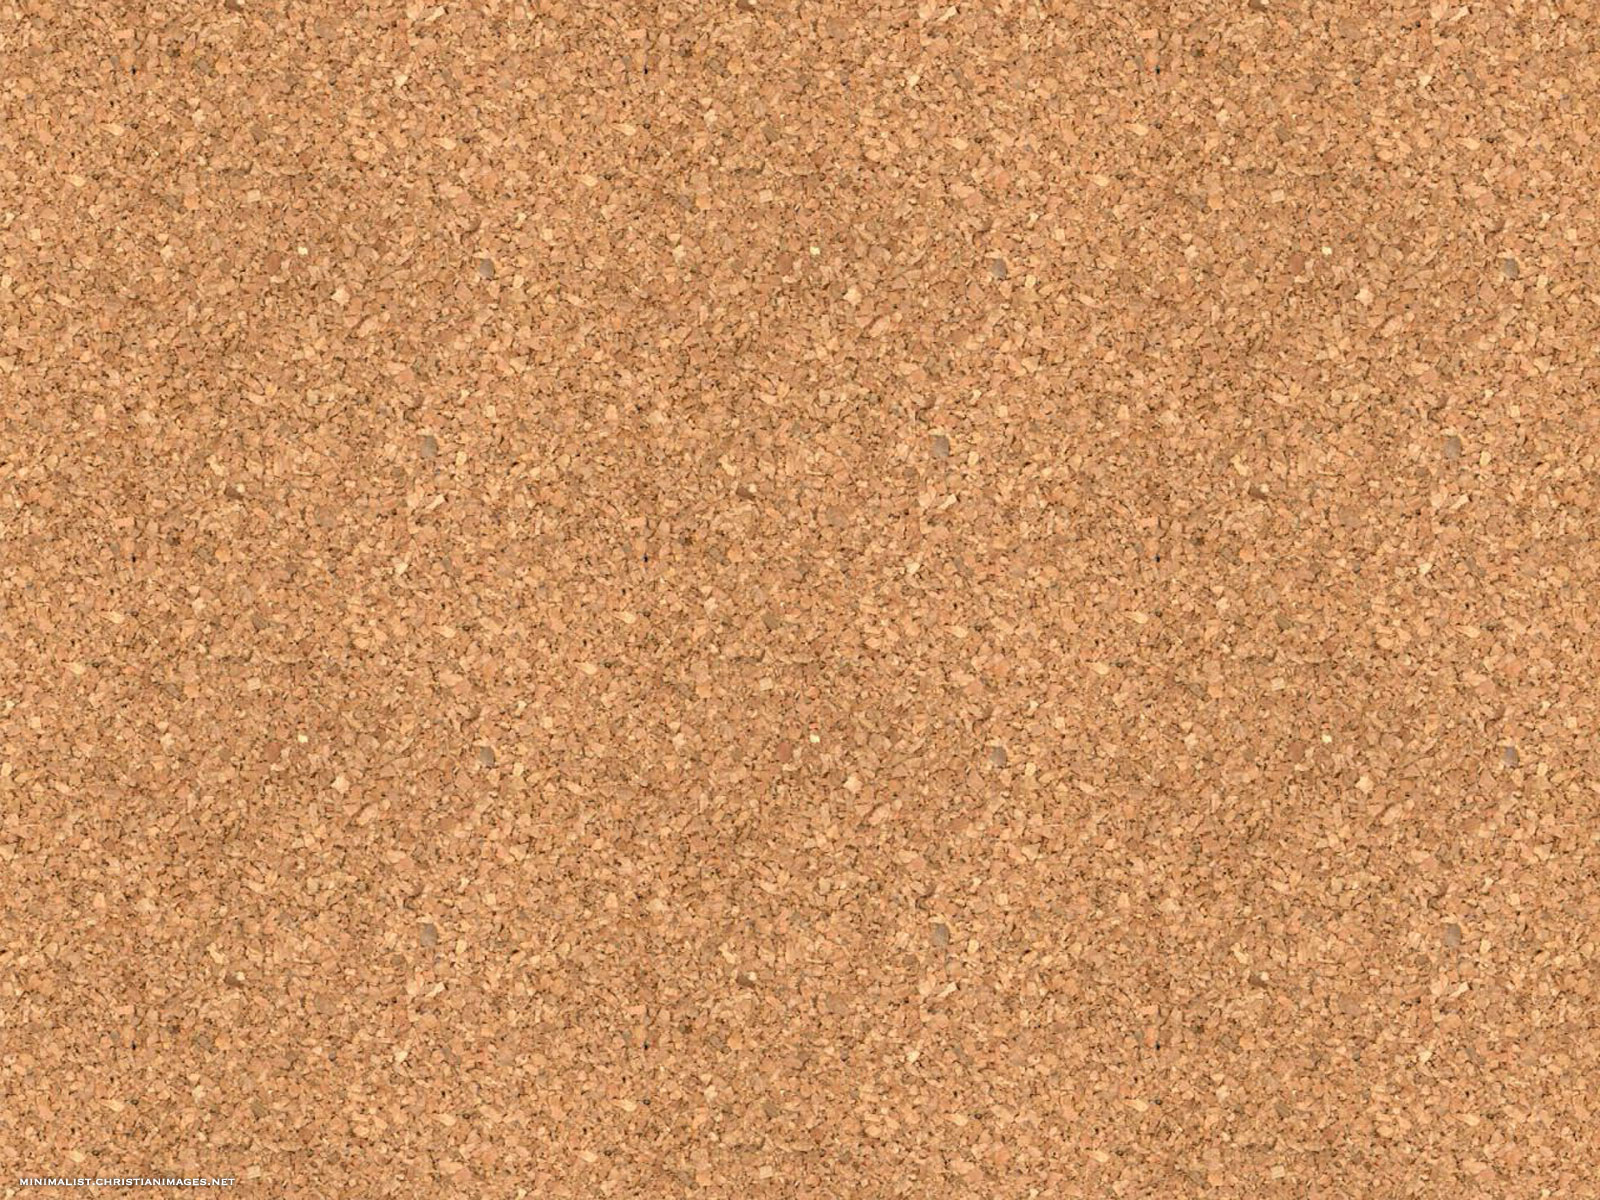 High Quality Cardboard Background